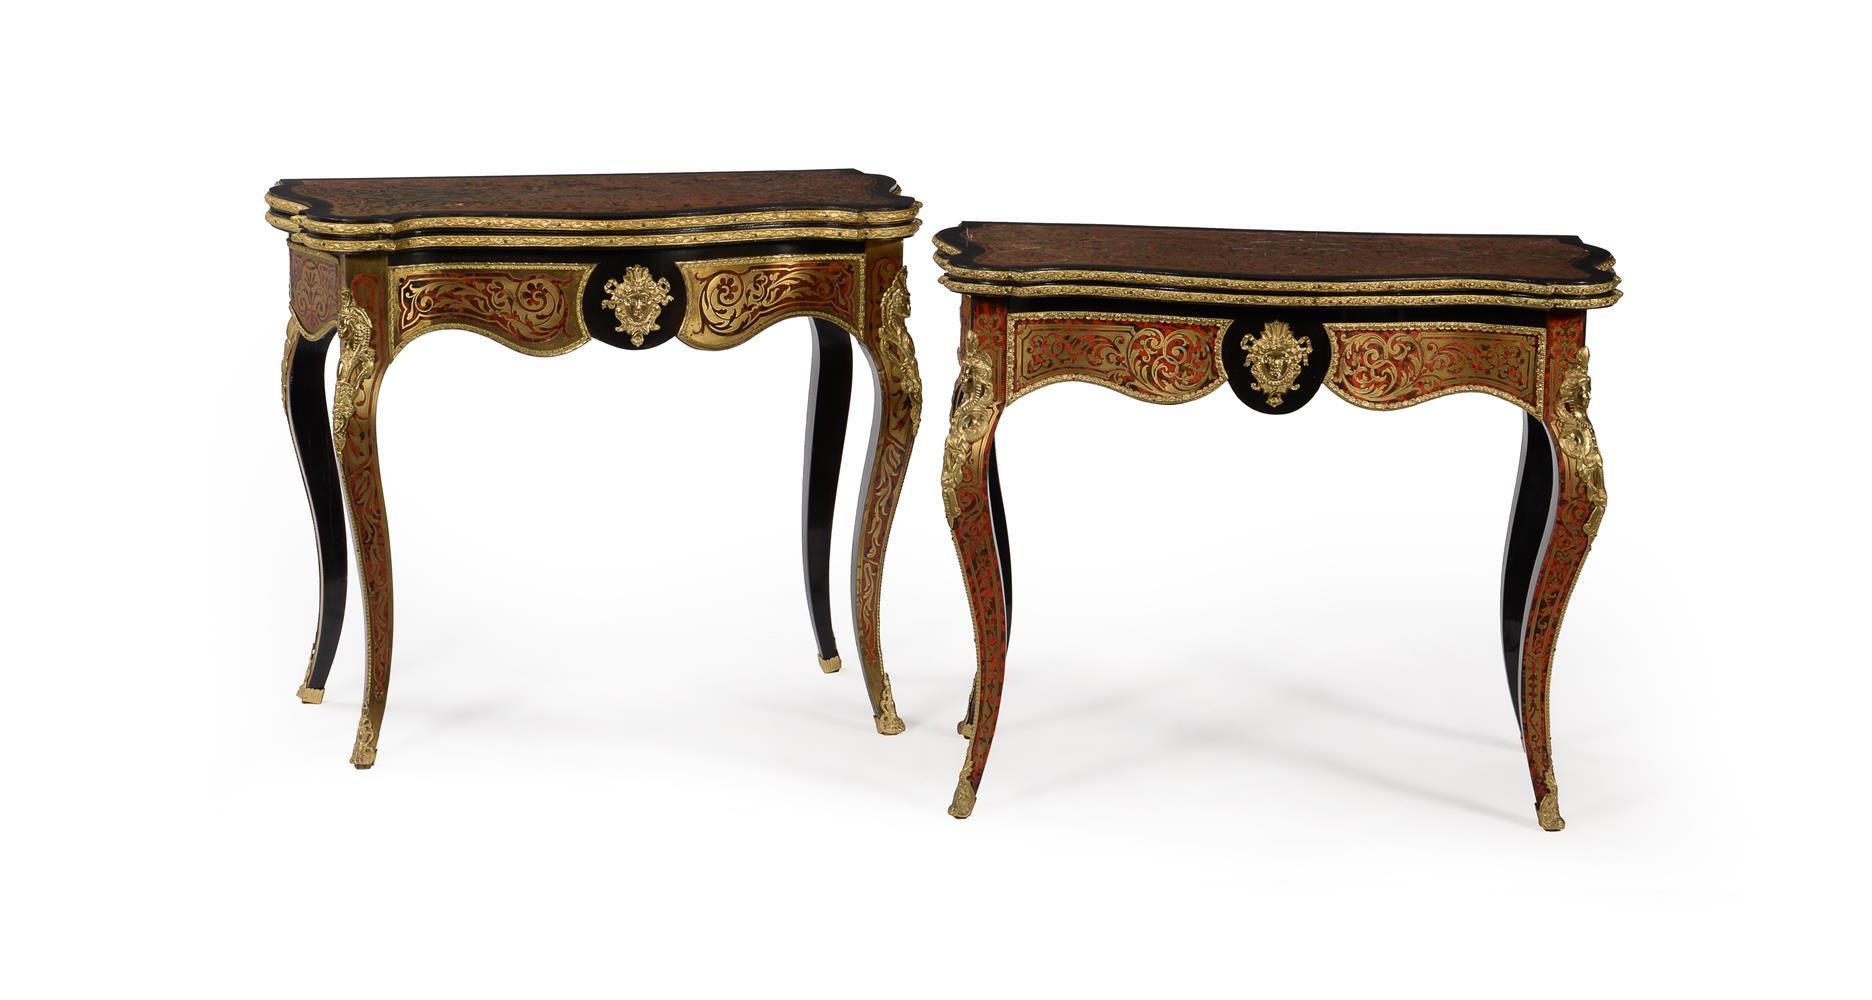 Two similar Napoleon III 'Boule' card tables